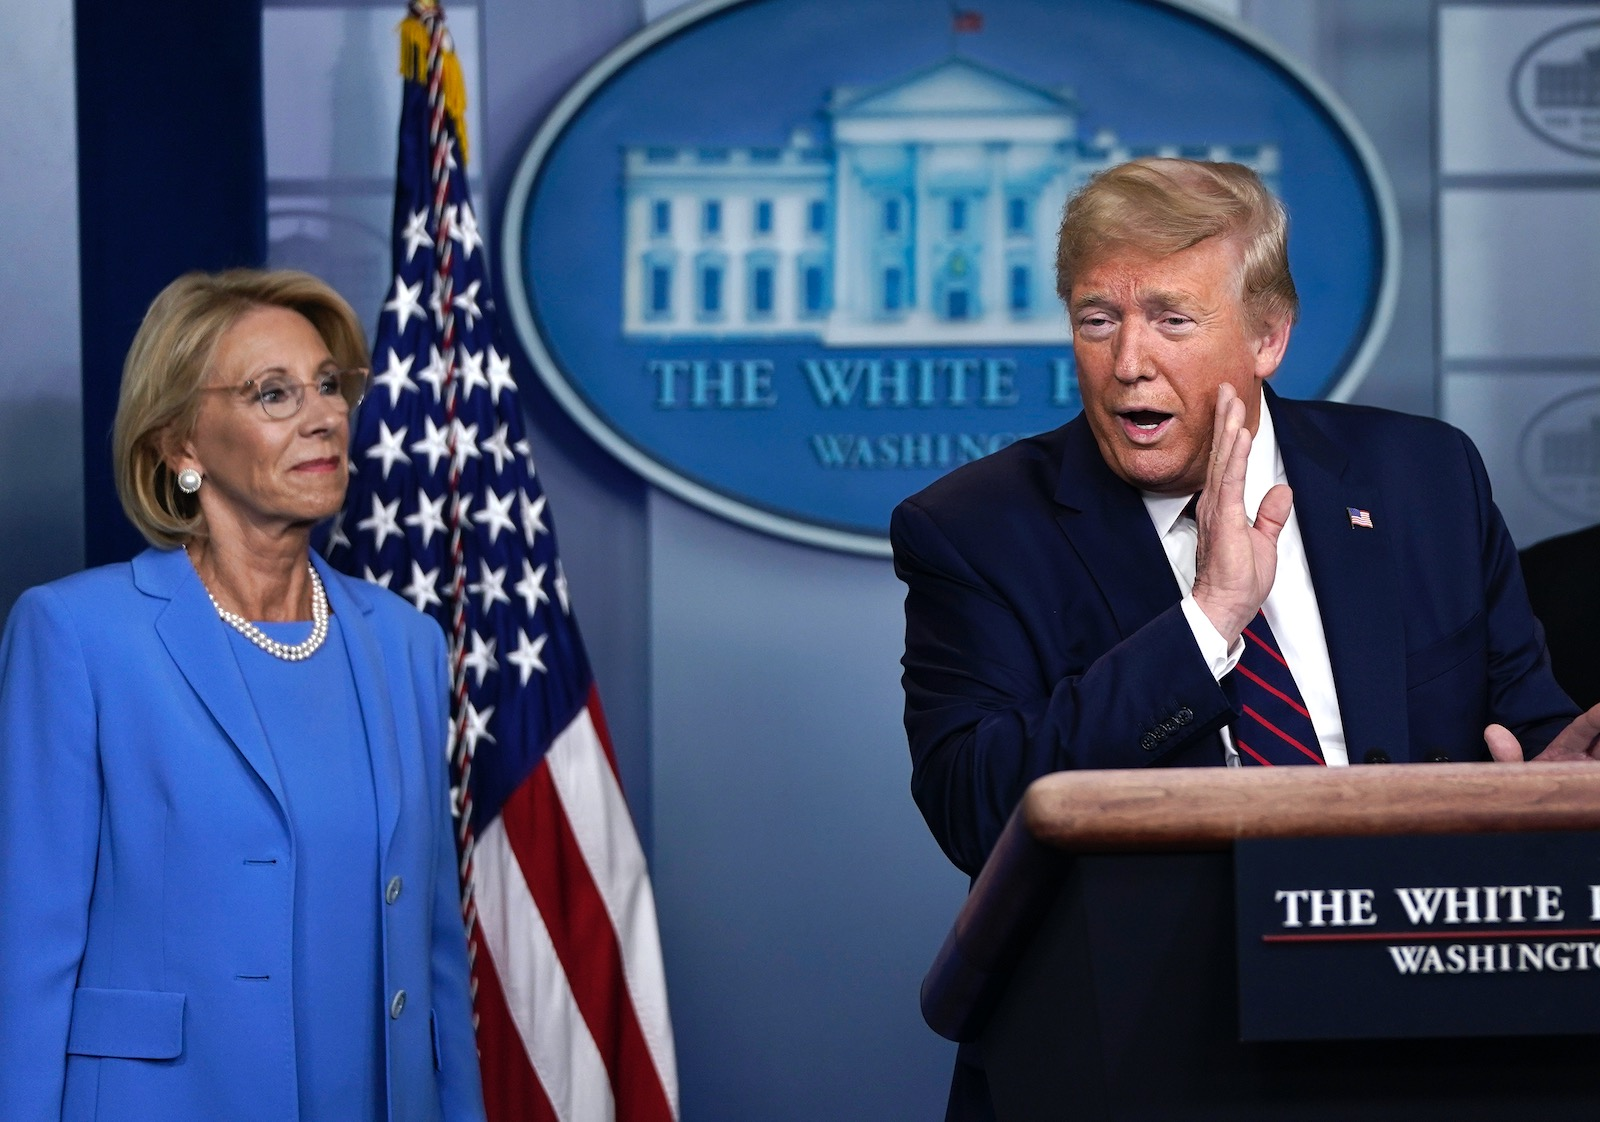 Secretary of Education Betsy DeVos attending President Trump's Coronavirus Task Force daily briefing, Washington, D.C., March 27, 2020